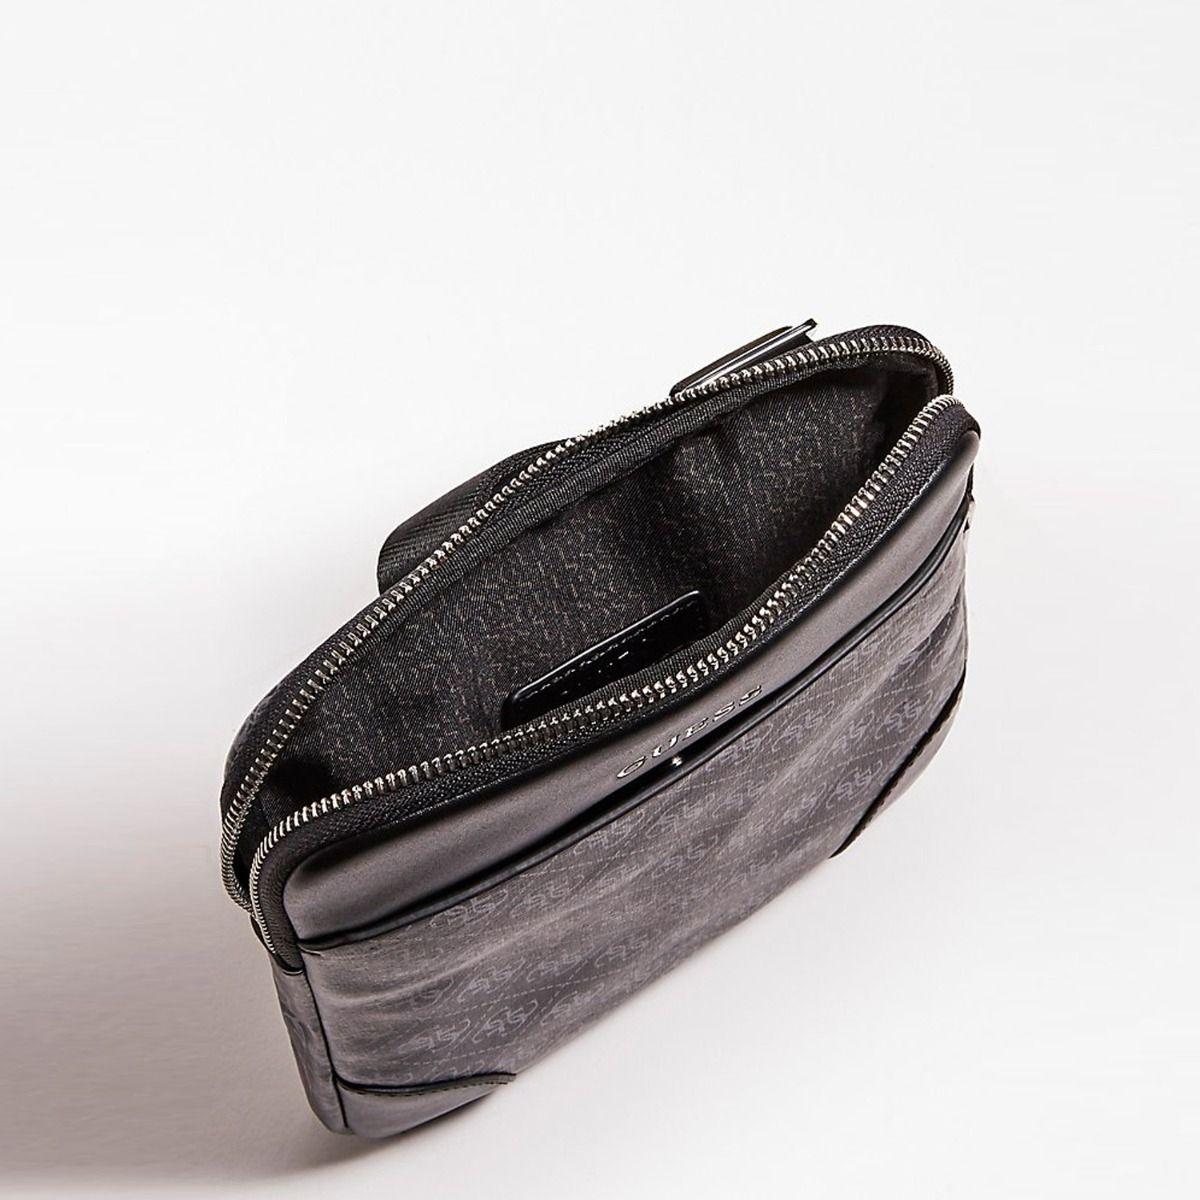 Guess portafoglio manhattan logo in ecopelle nero